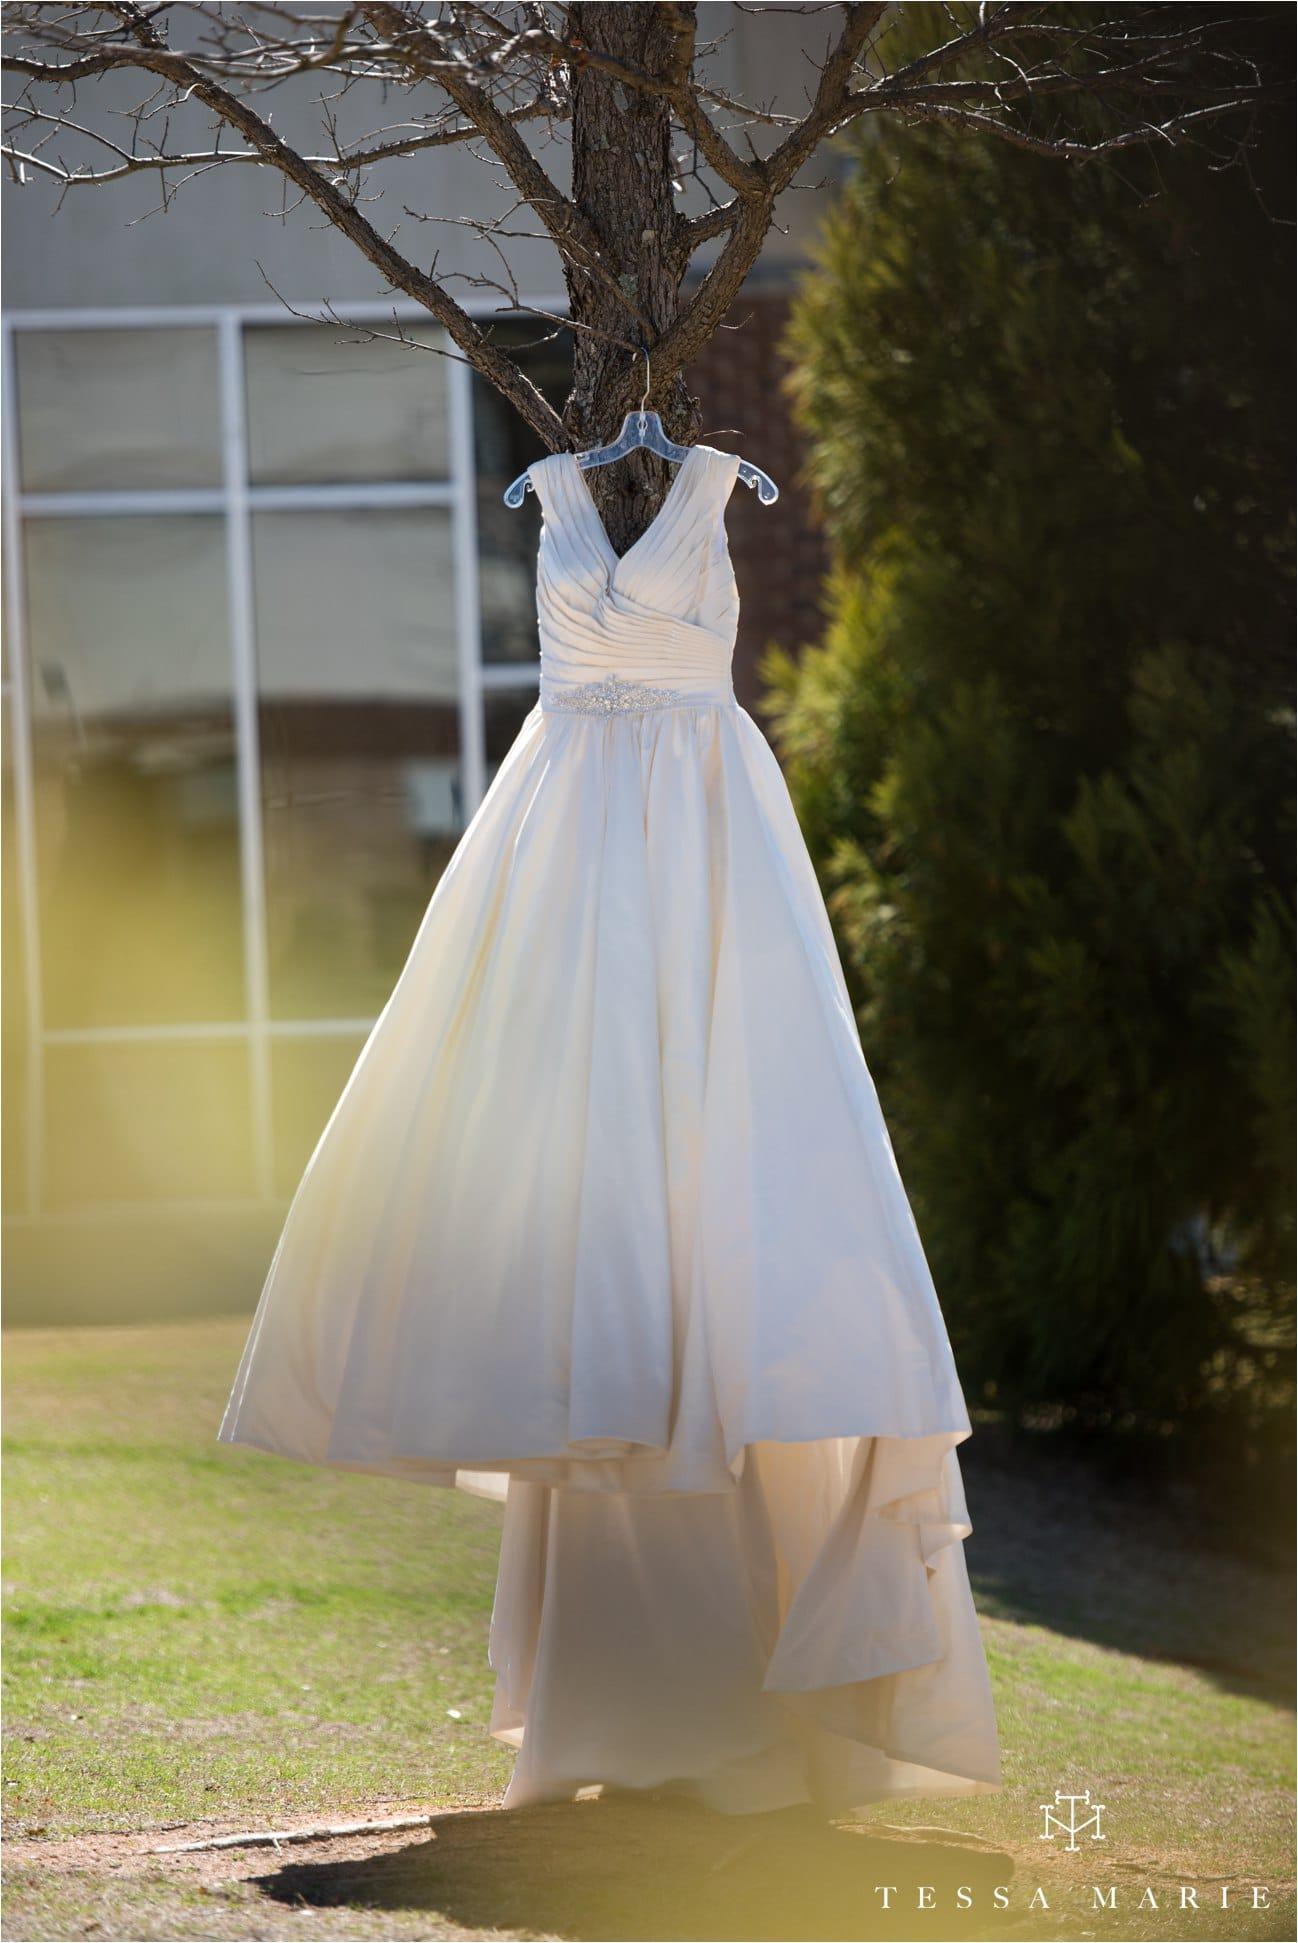 tessa_marie_weddings_wedding_moments_Tessa_marie_studios_0002